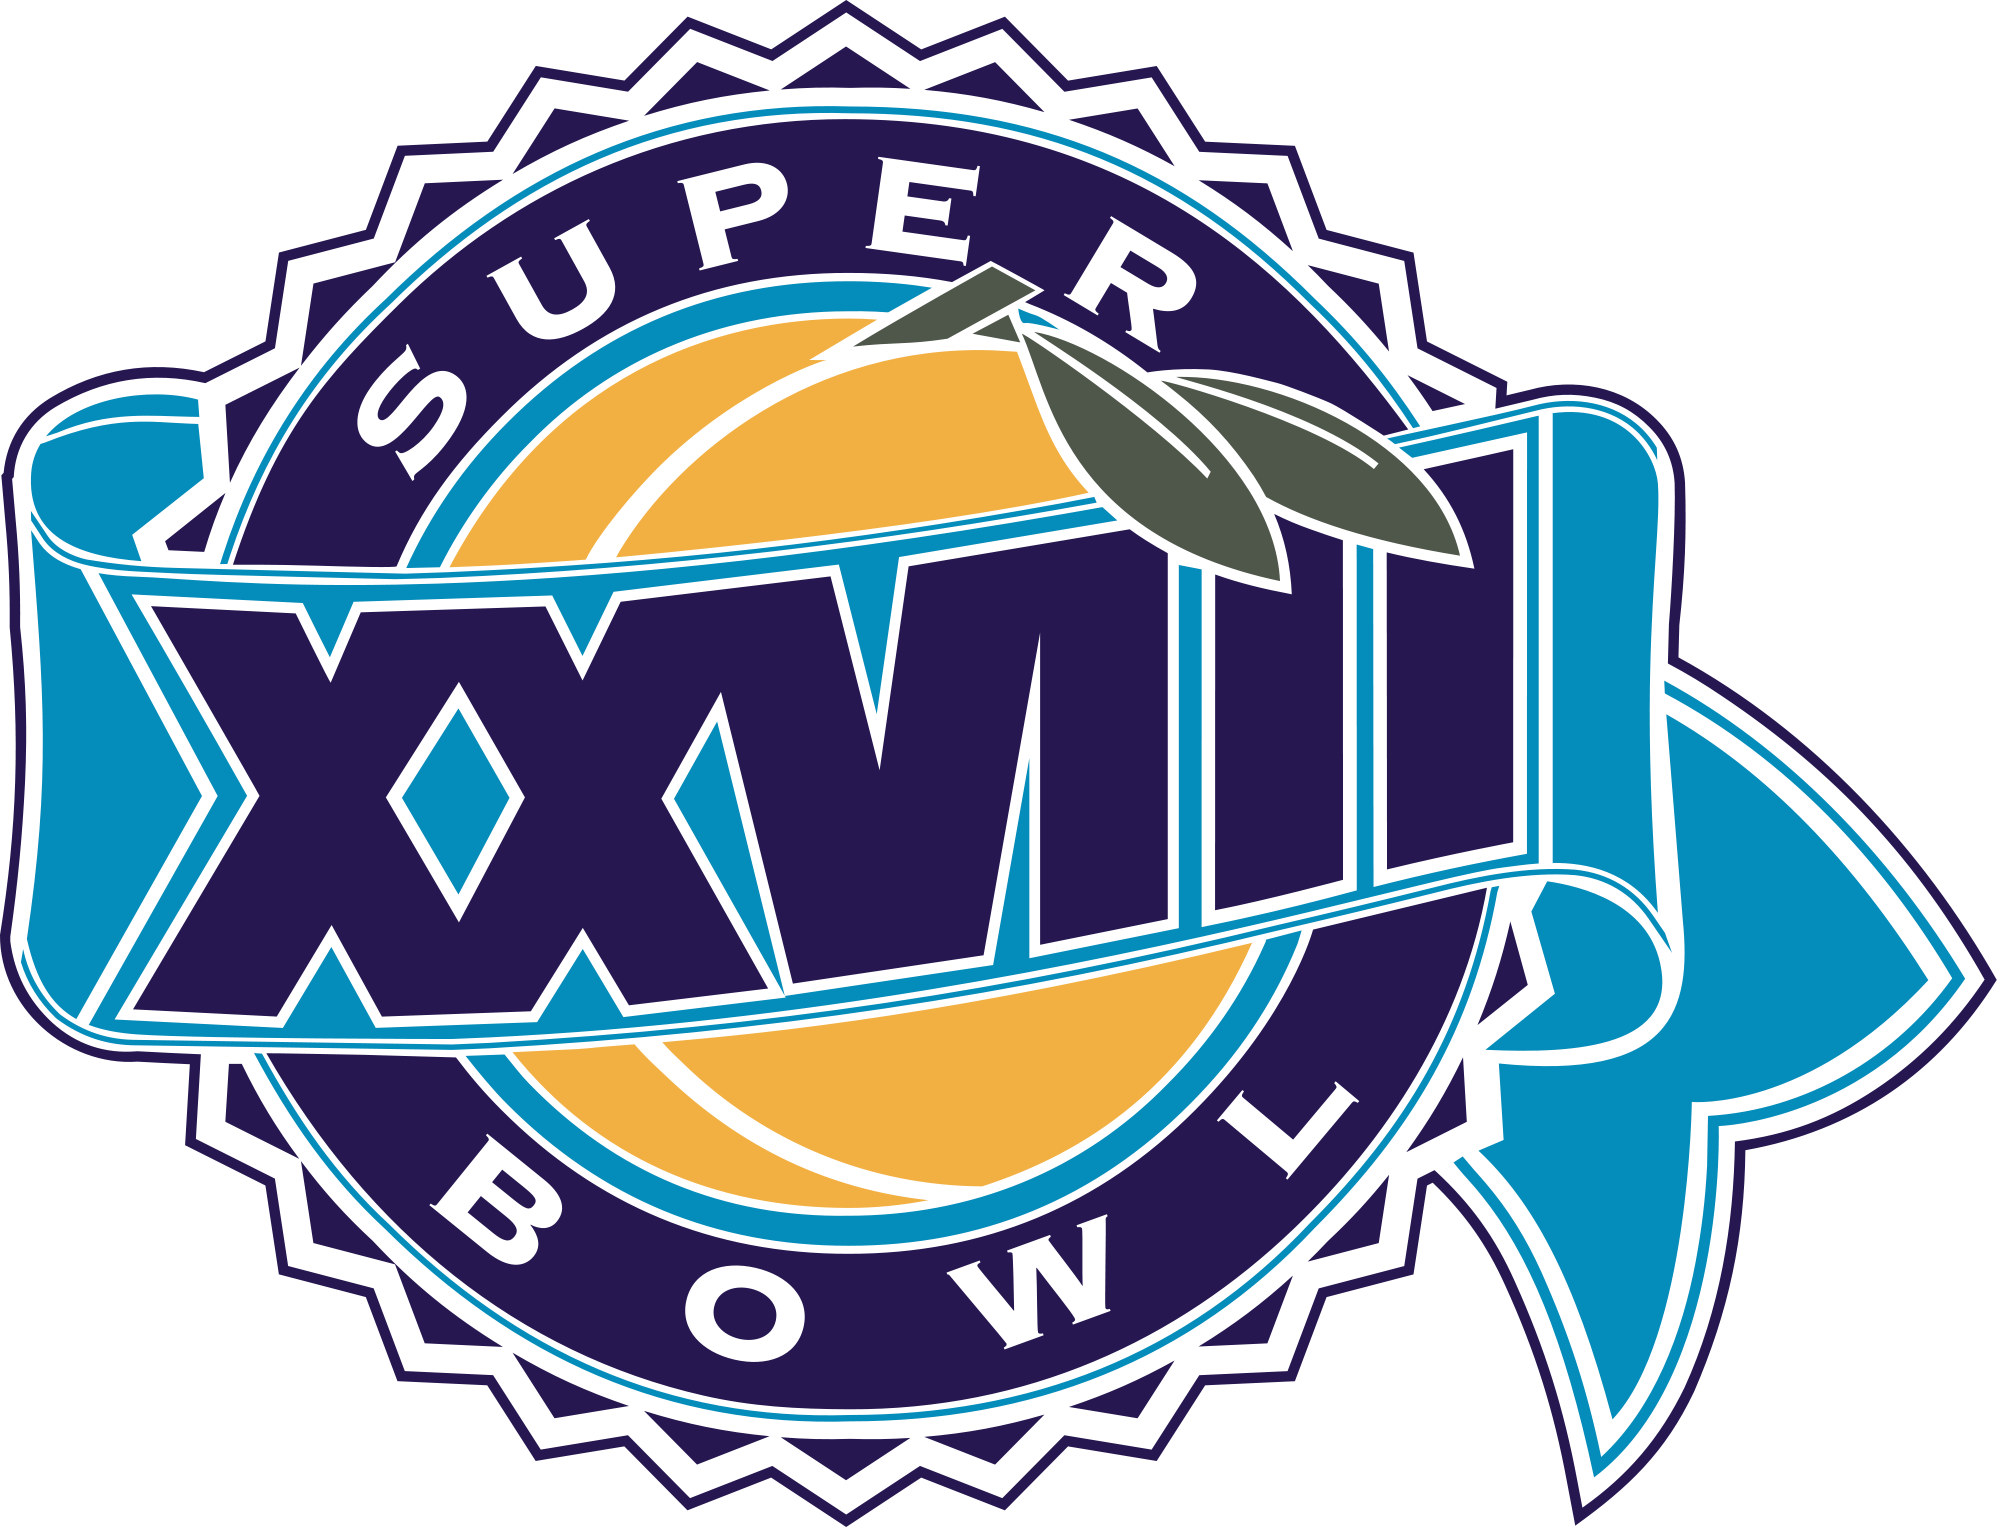 Super Bowl Xxviii Ano 1994 Superbowl Logo Super Bowl Nfl Championships